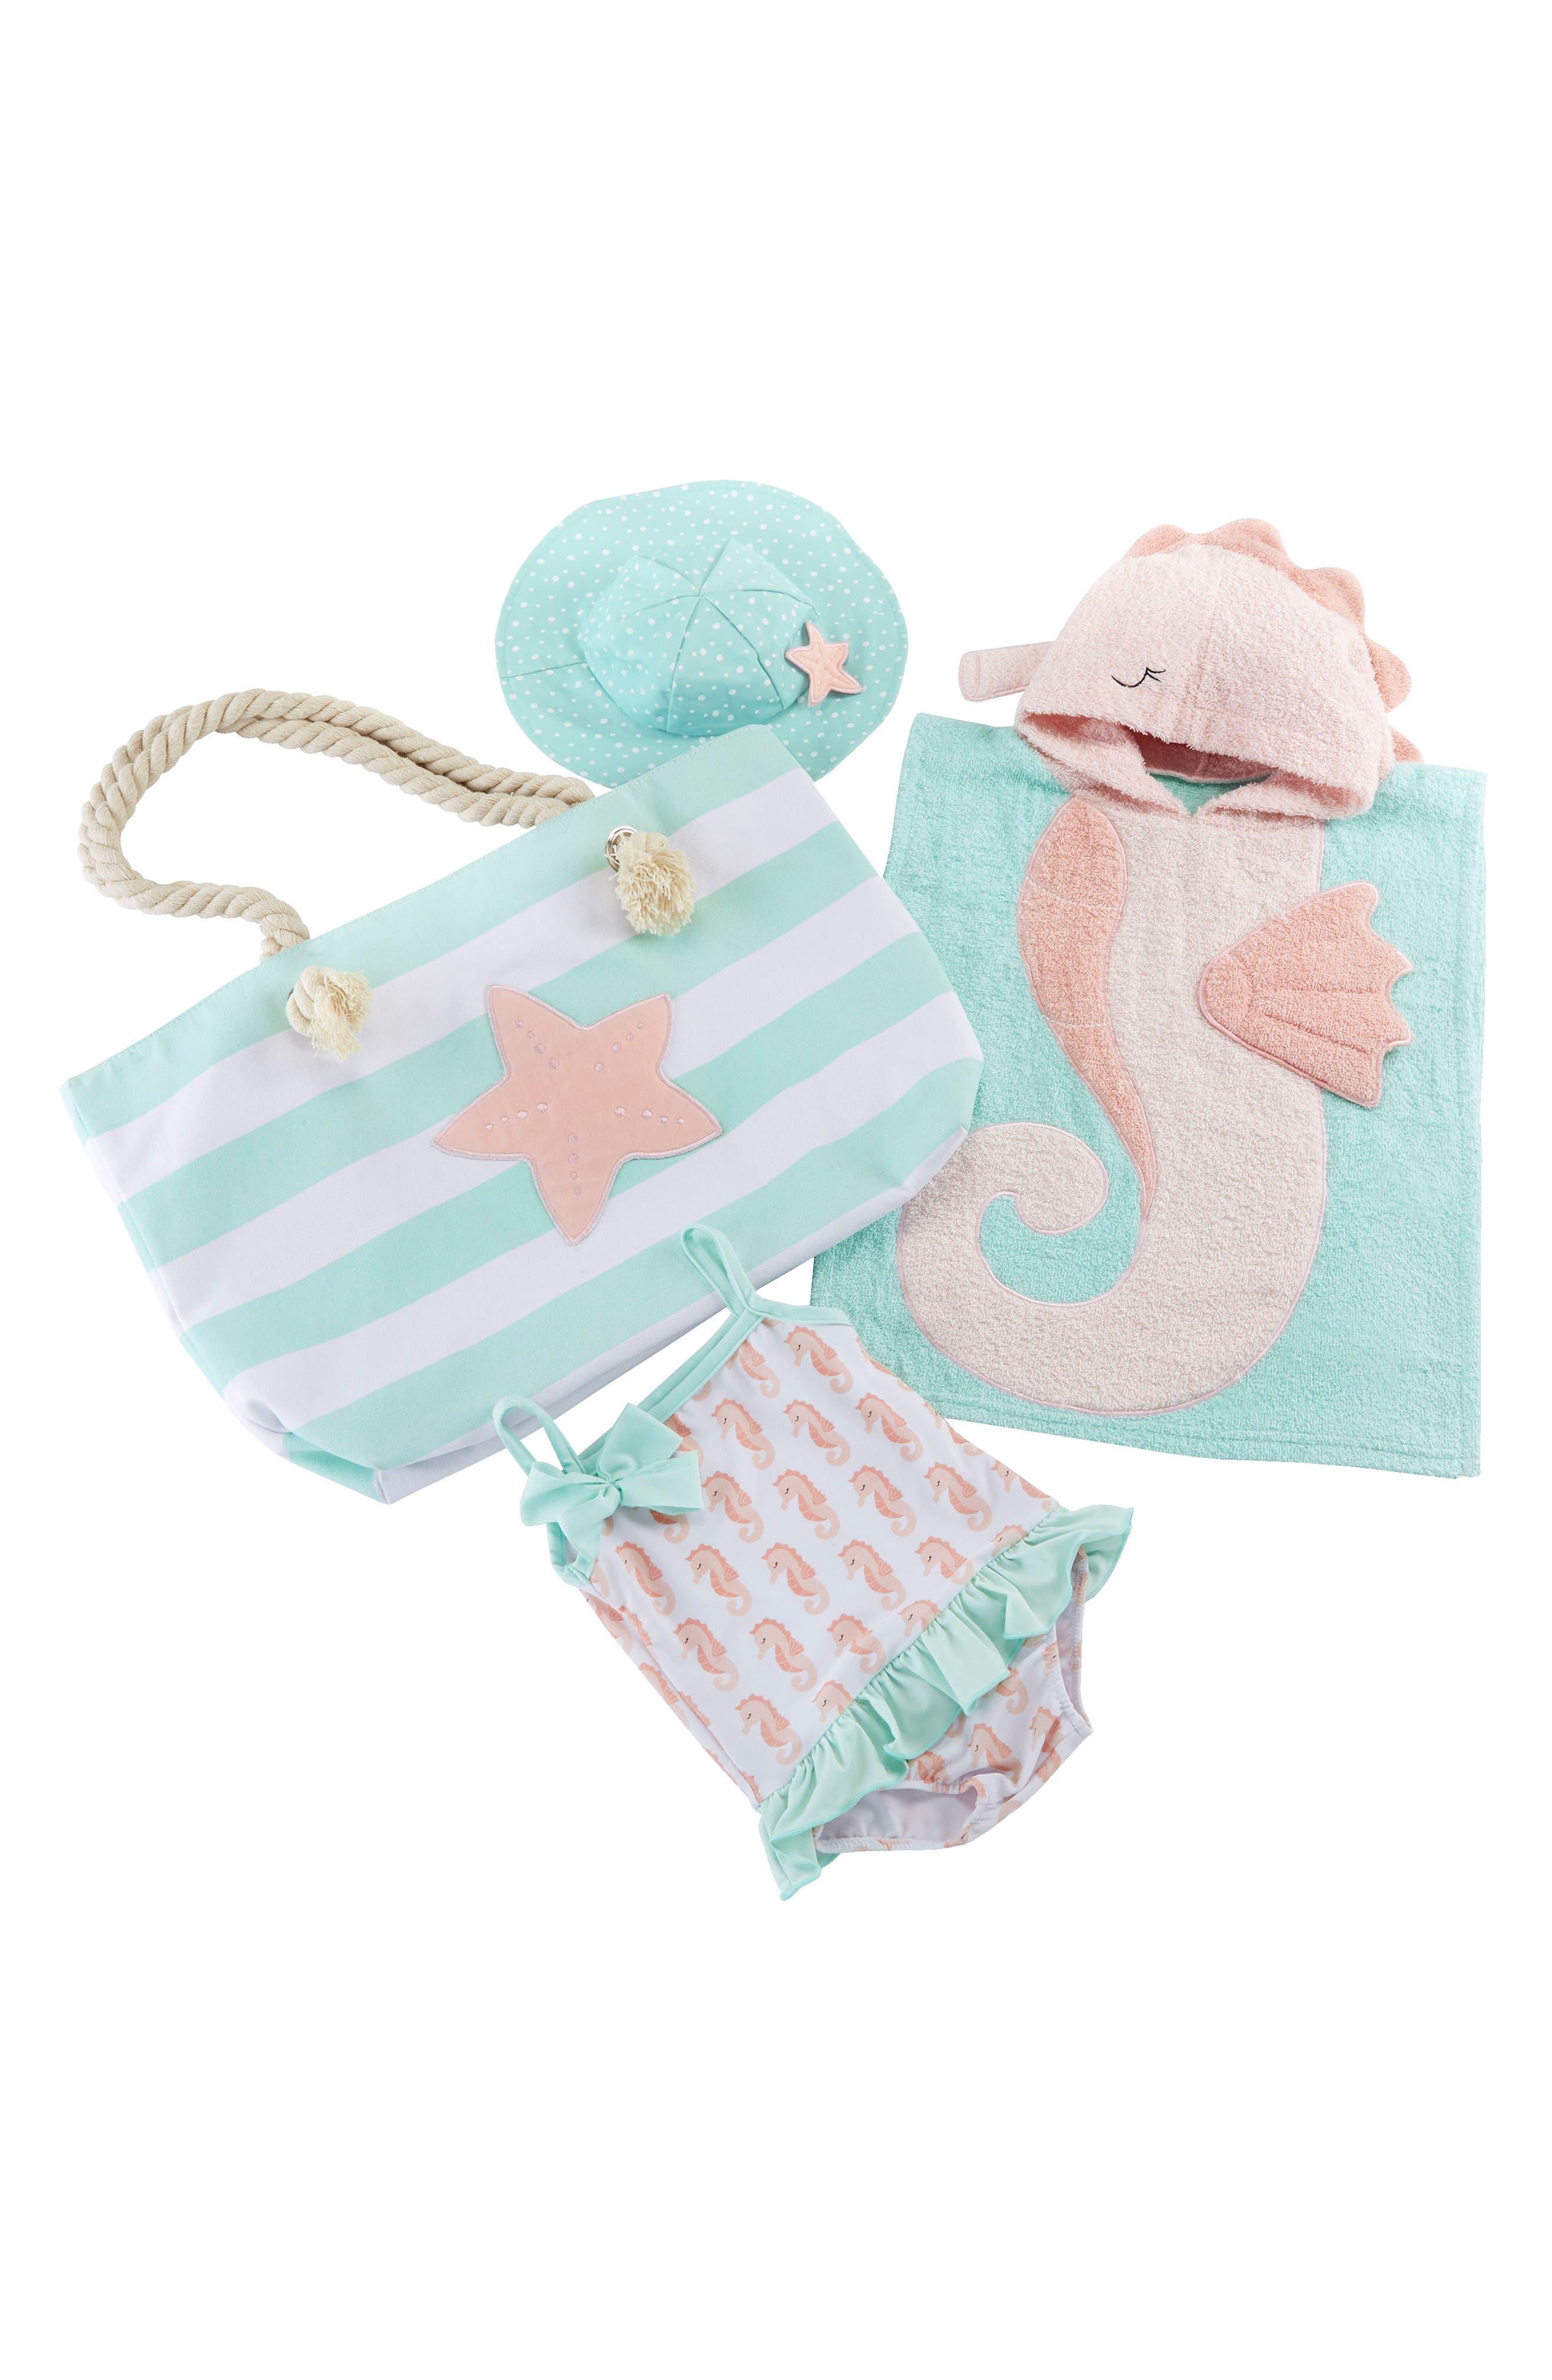 BABY ASPEN, Seahorse Hooded Towel, Swimsuit, Sun Hat & Tote Set, Main thumbnail 1, color, 690